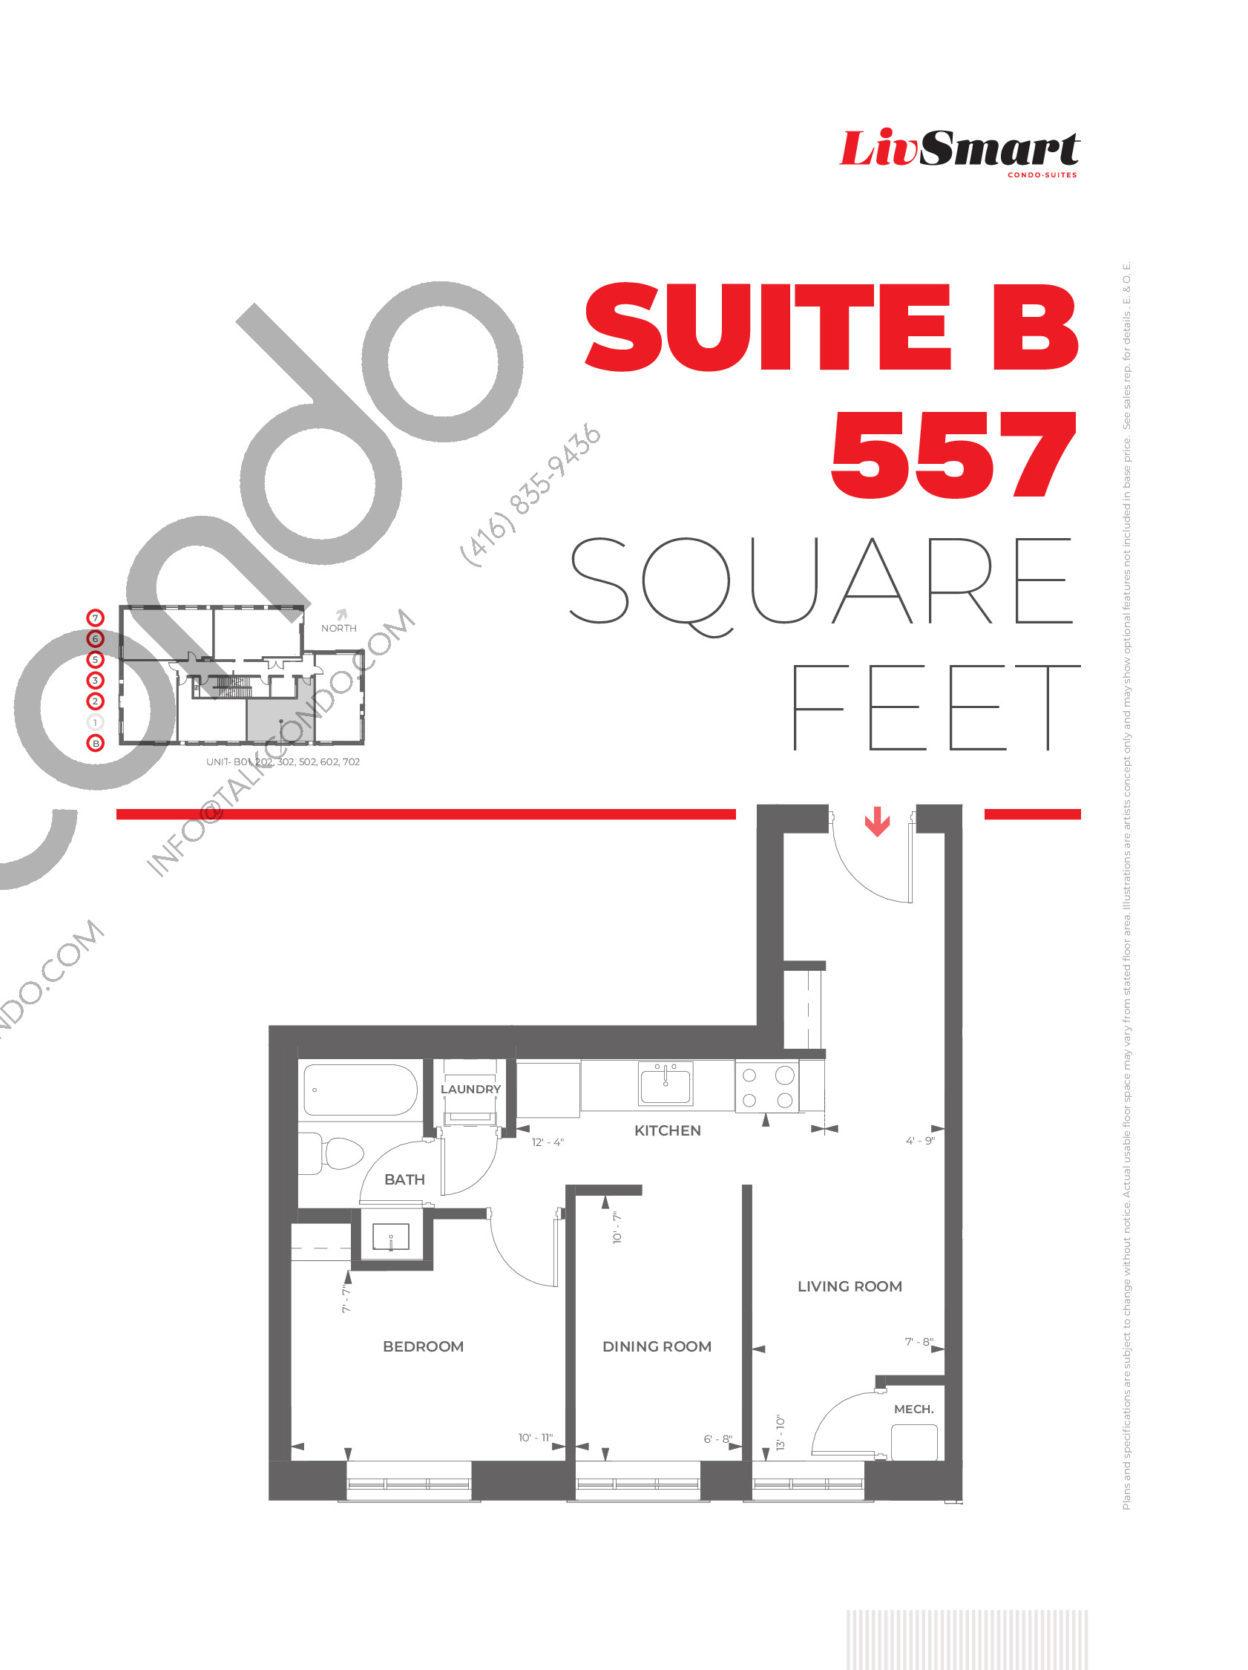 Suite B Floor Plan at LivSmart Condos - 557 sq.ft